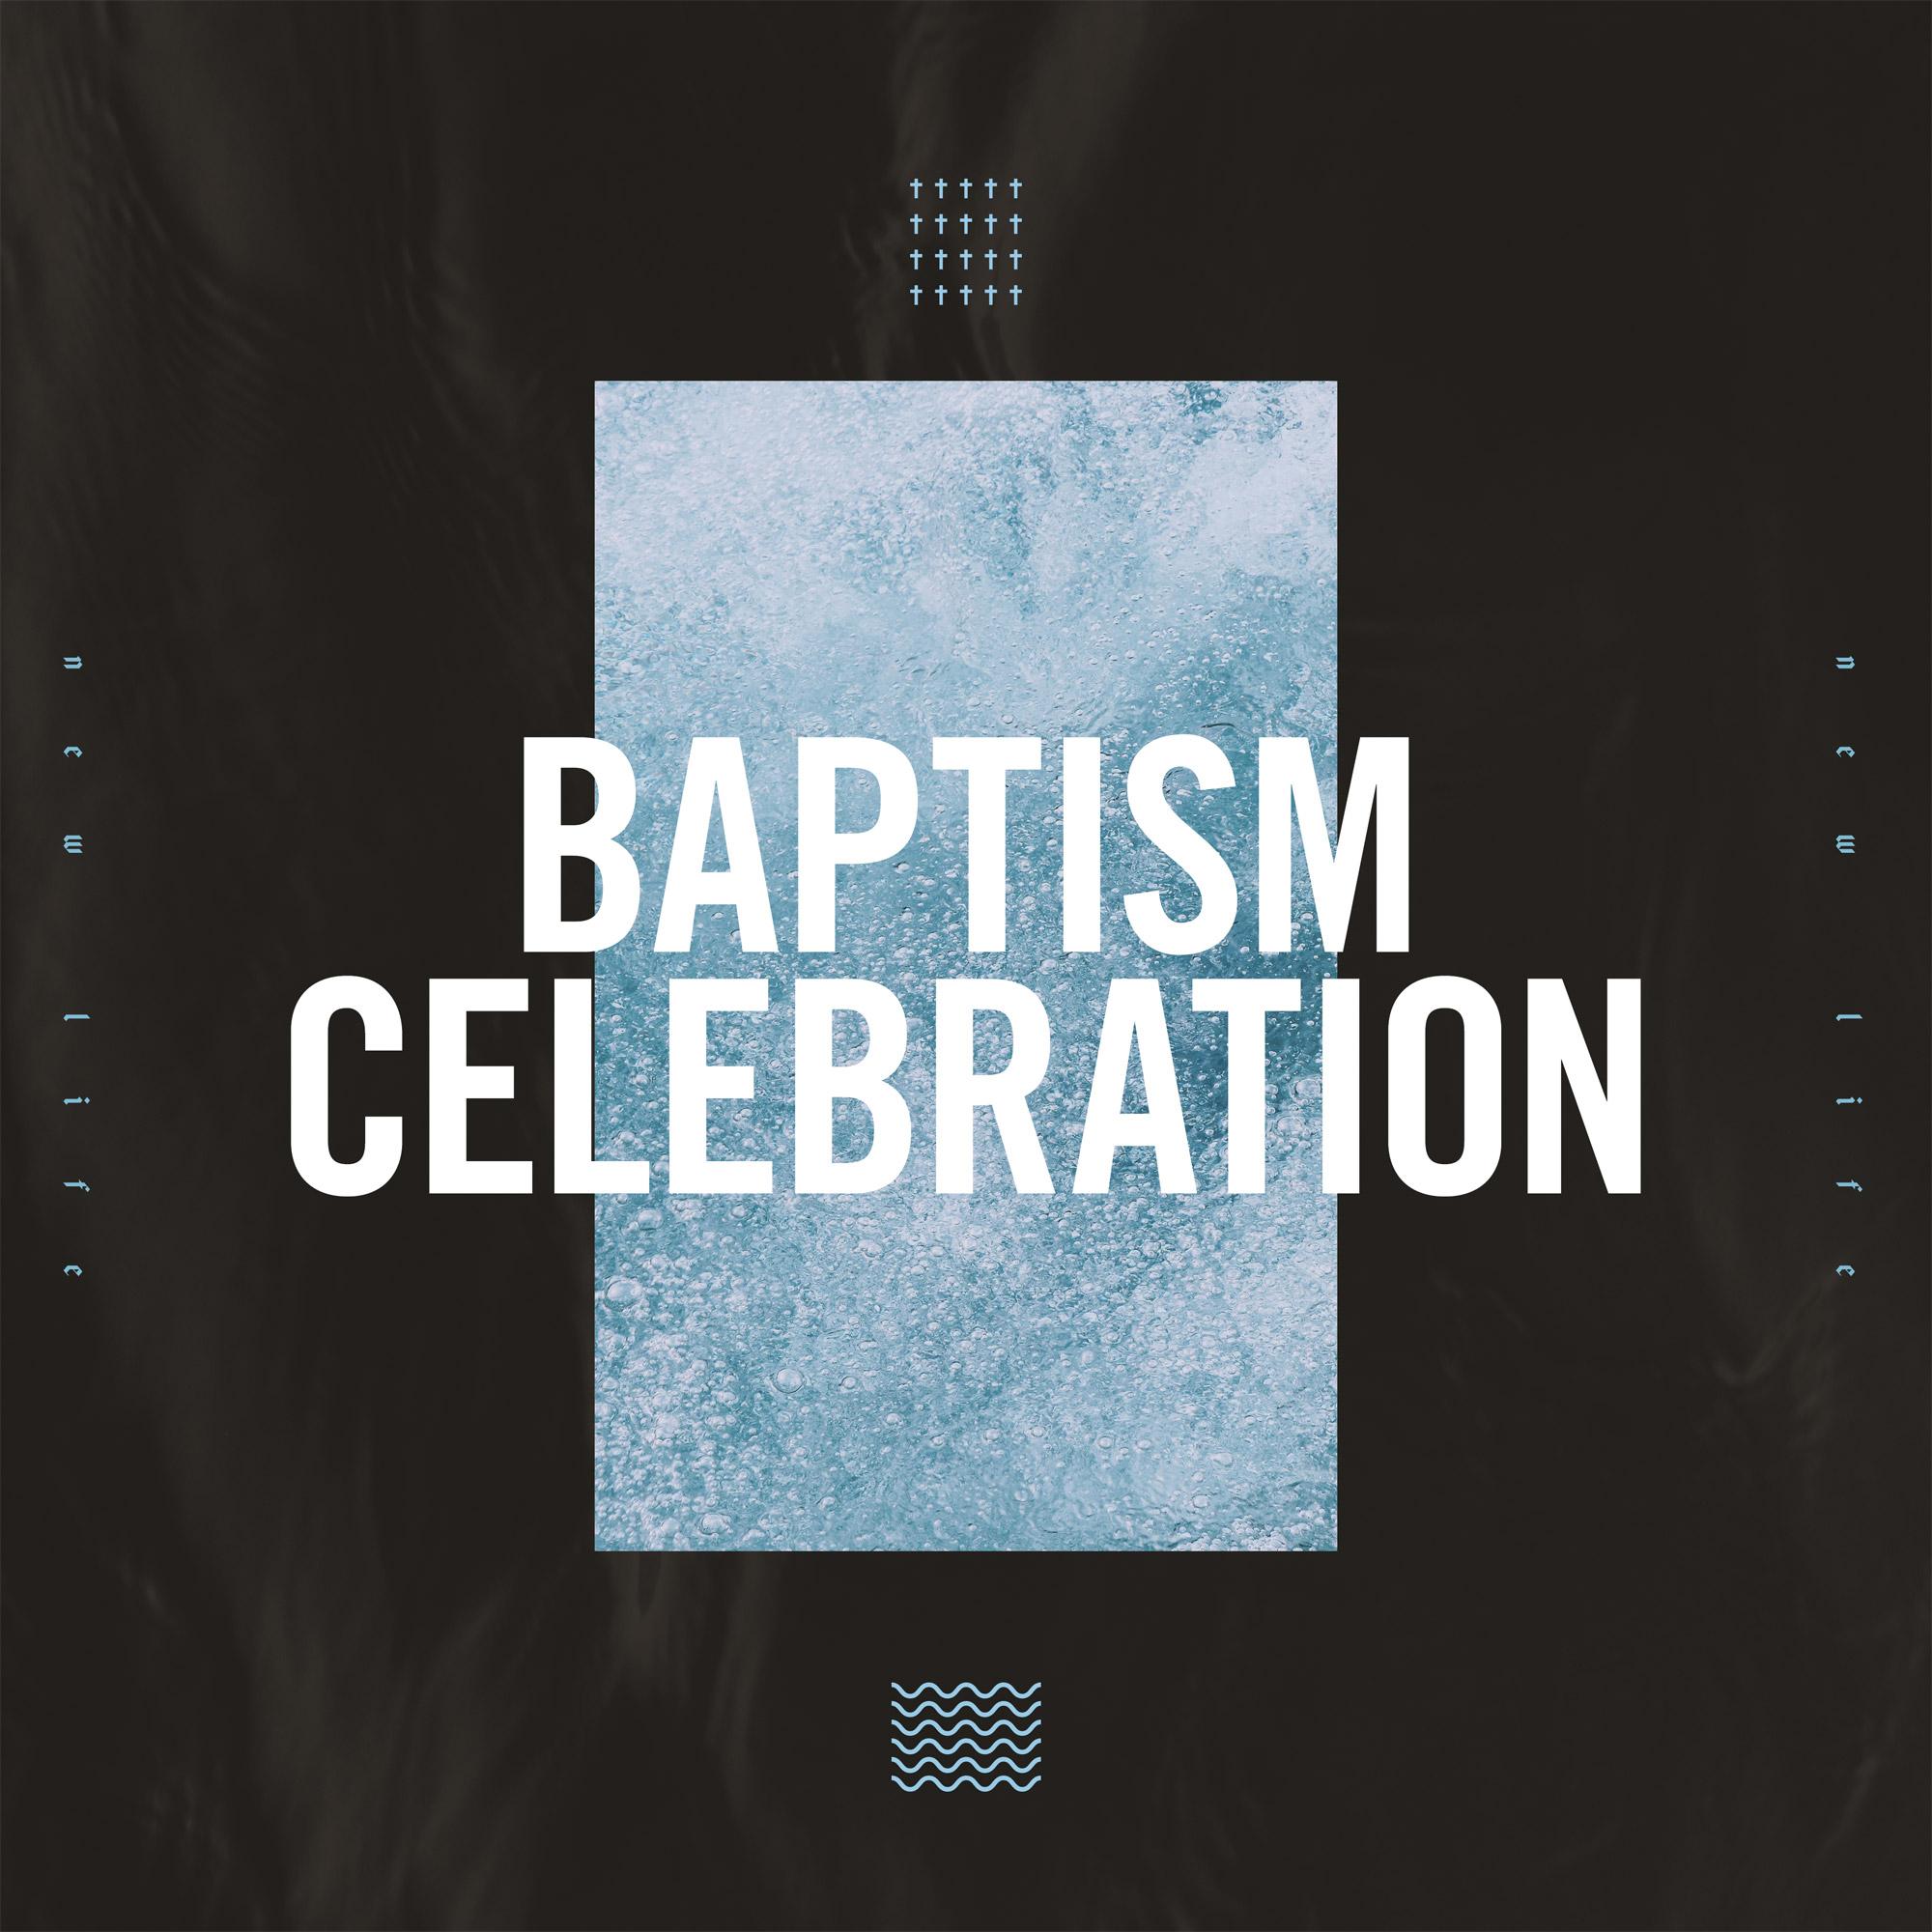 Baptism_SQ.jpg